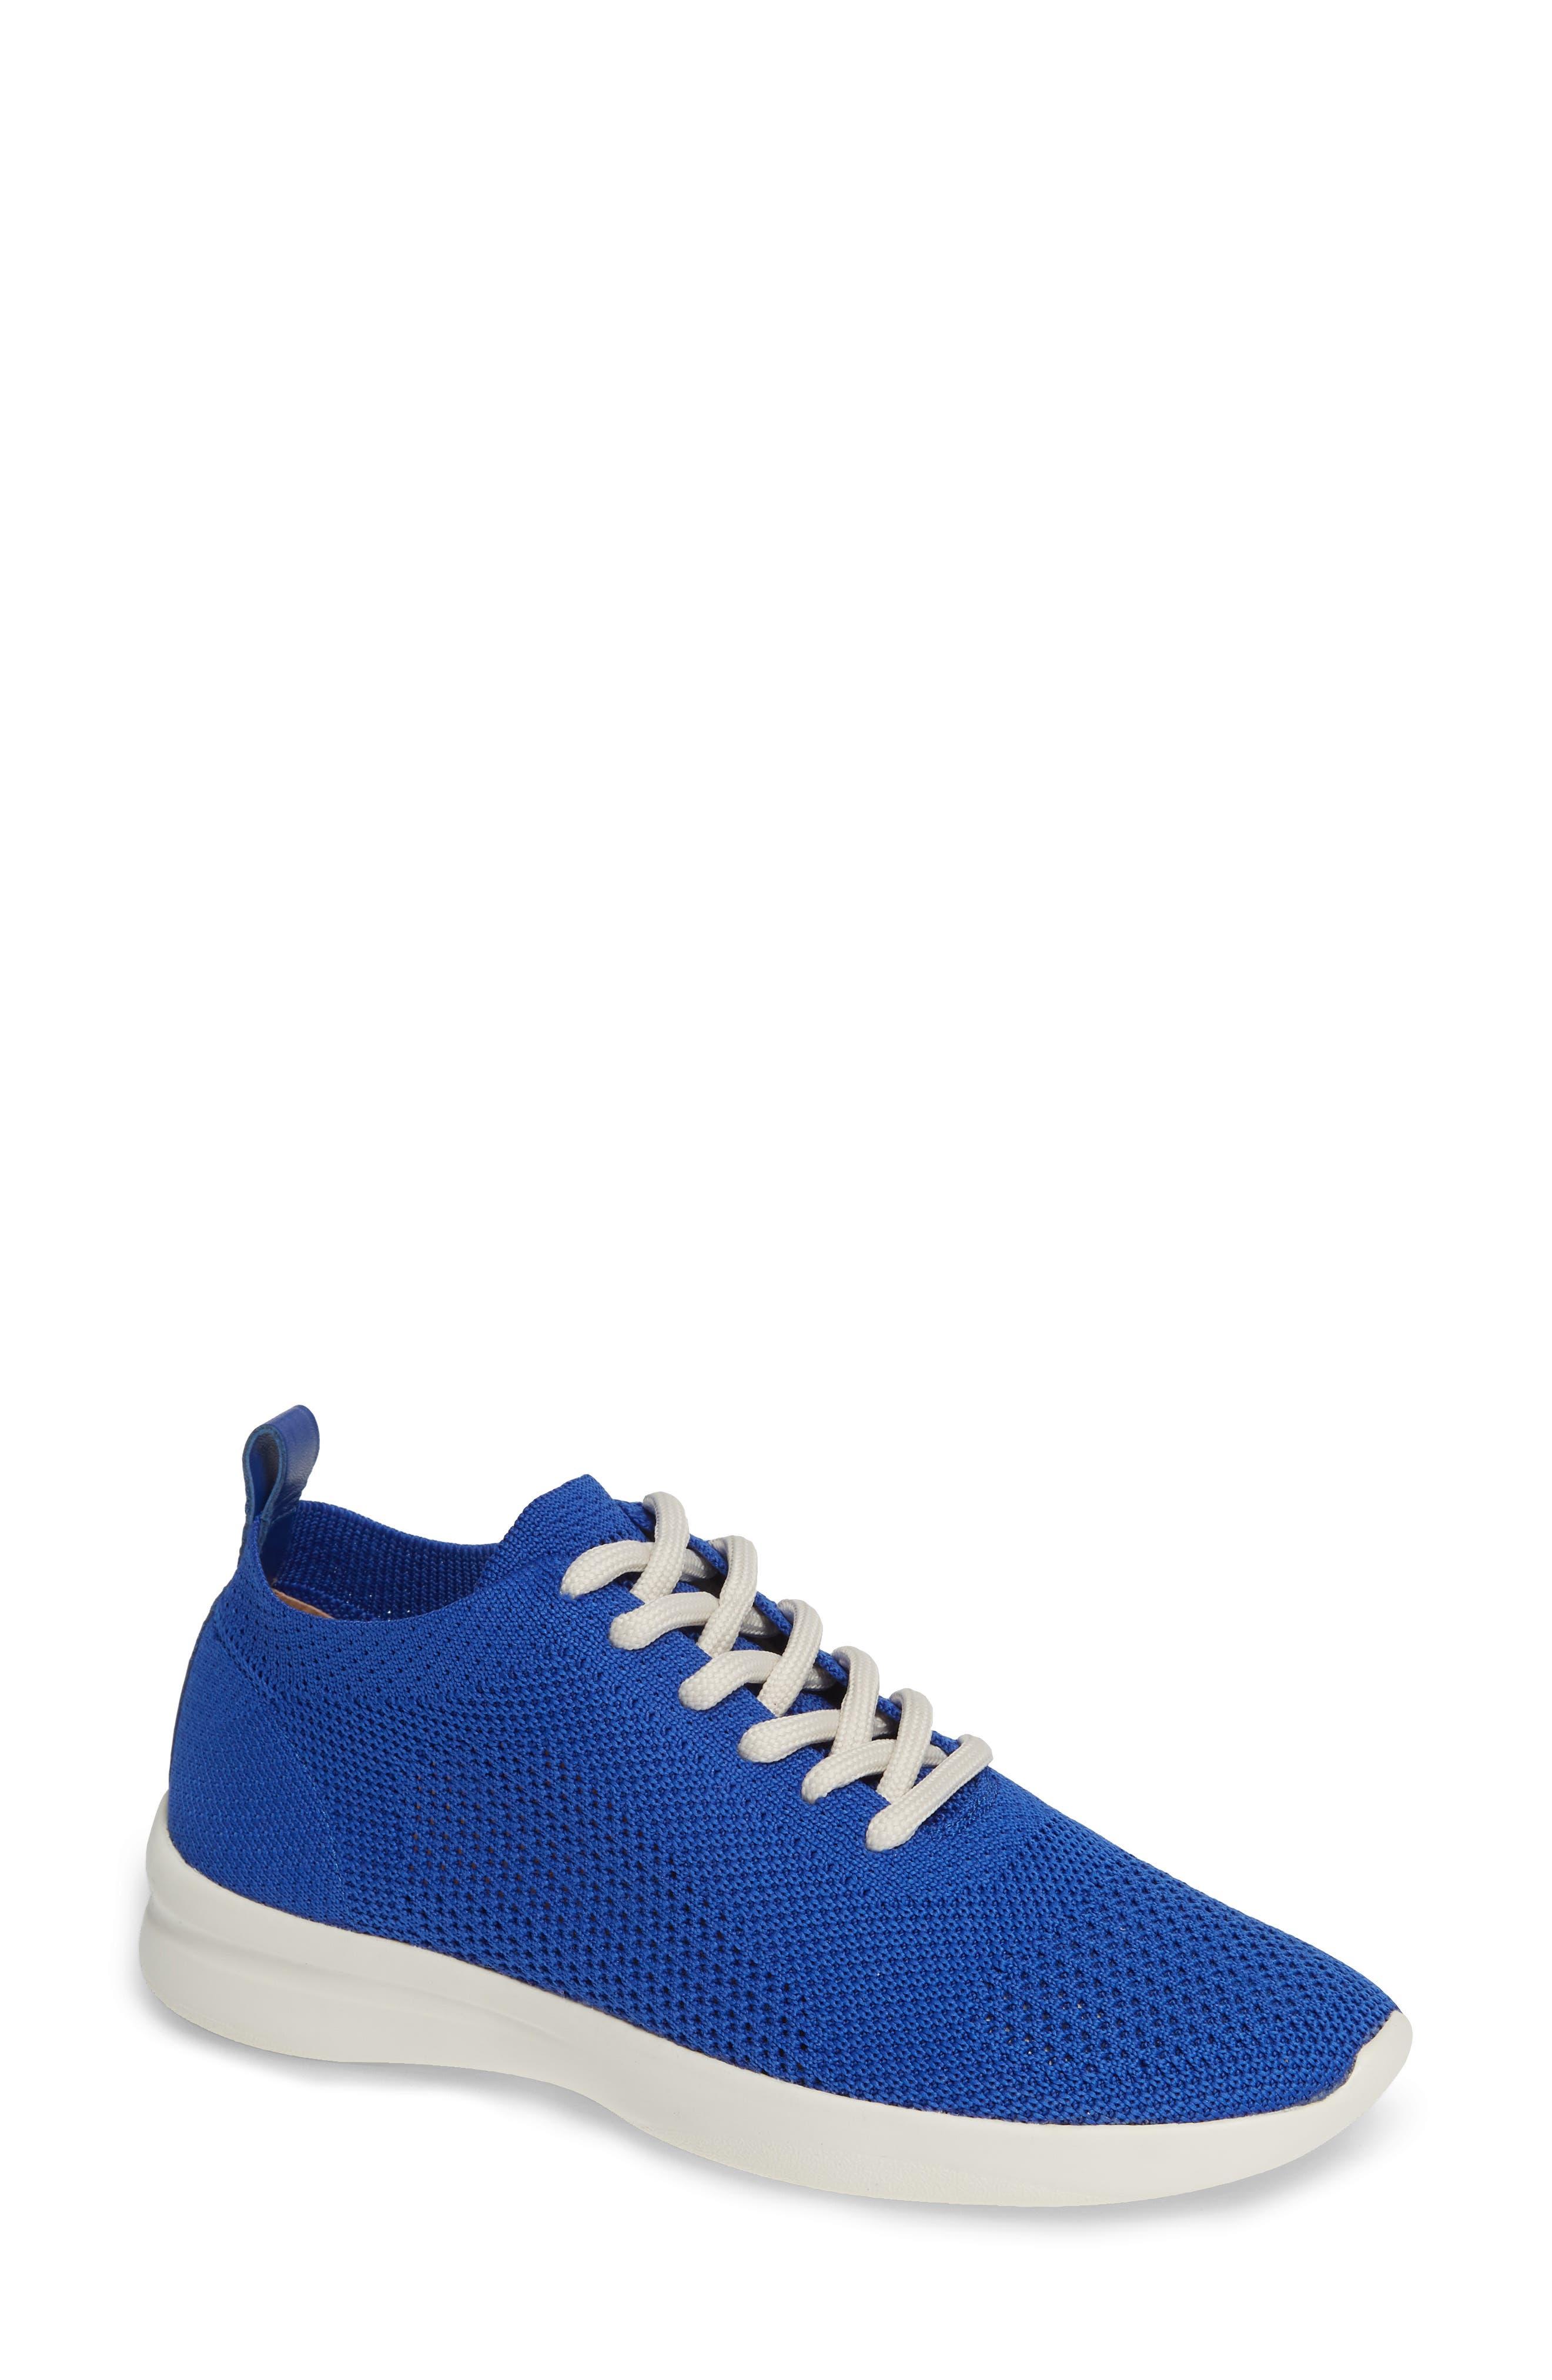 Randee Sneaker,                             Main thumbnail 1, color,